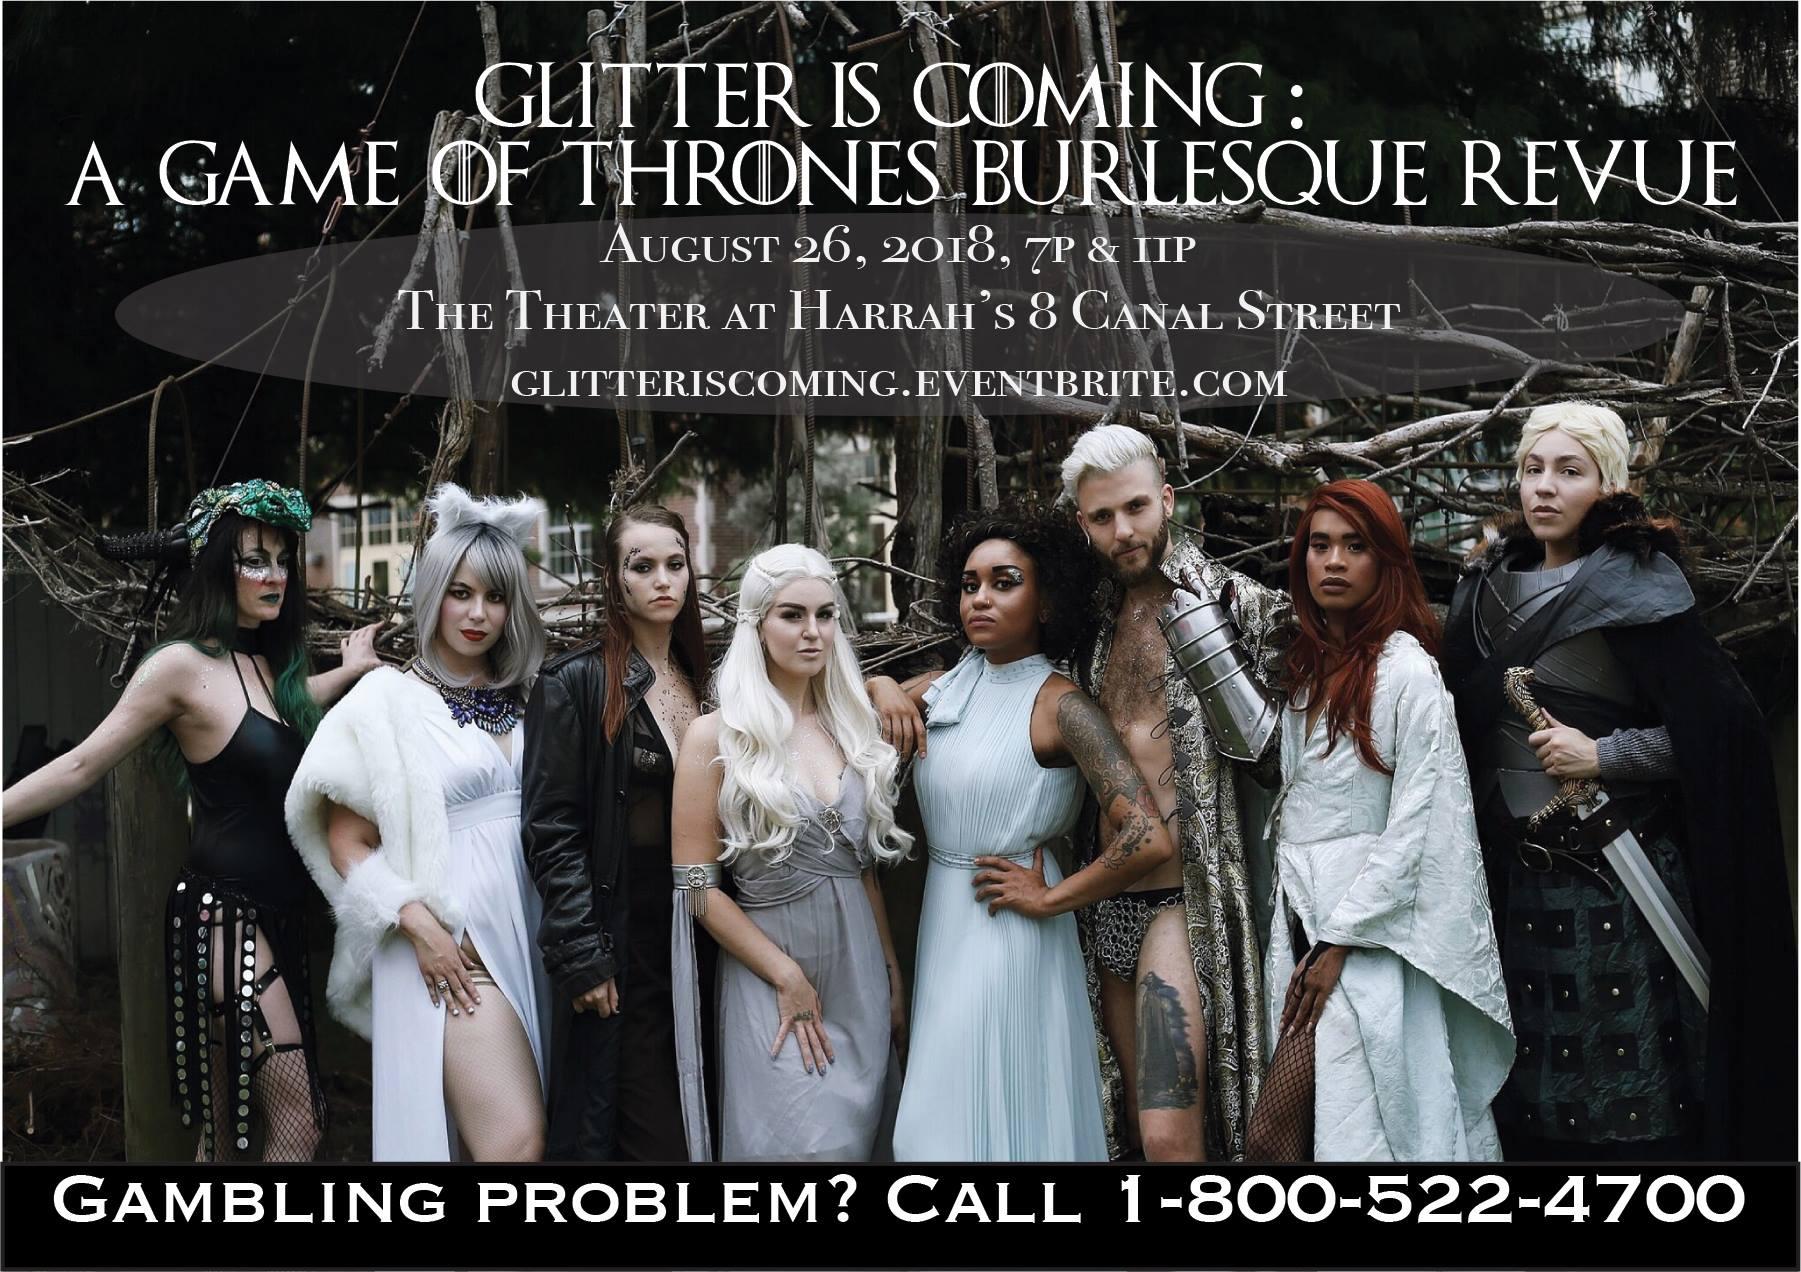 Glitter Is Coming: GoT Burlesque